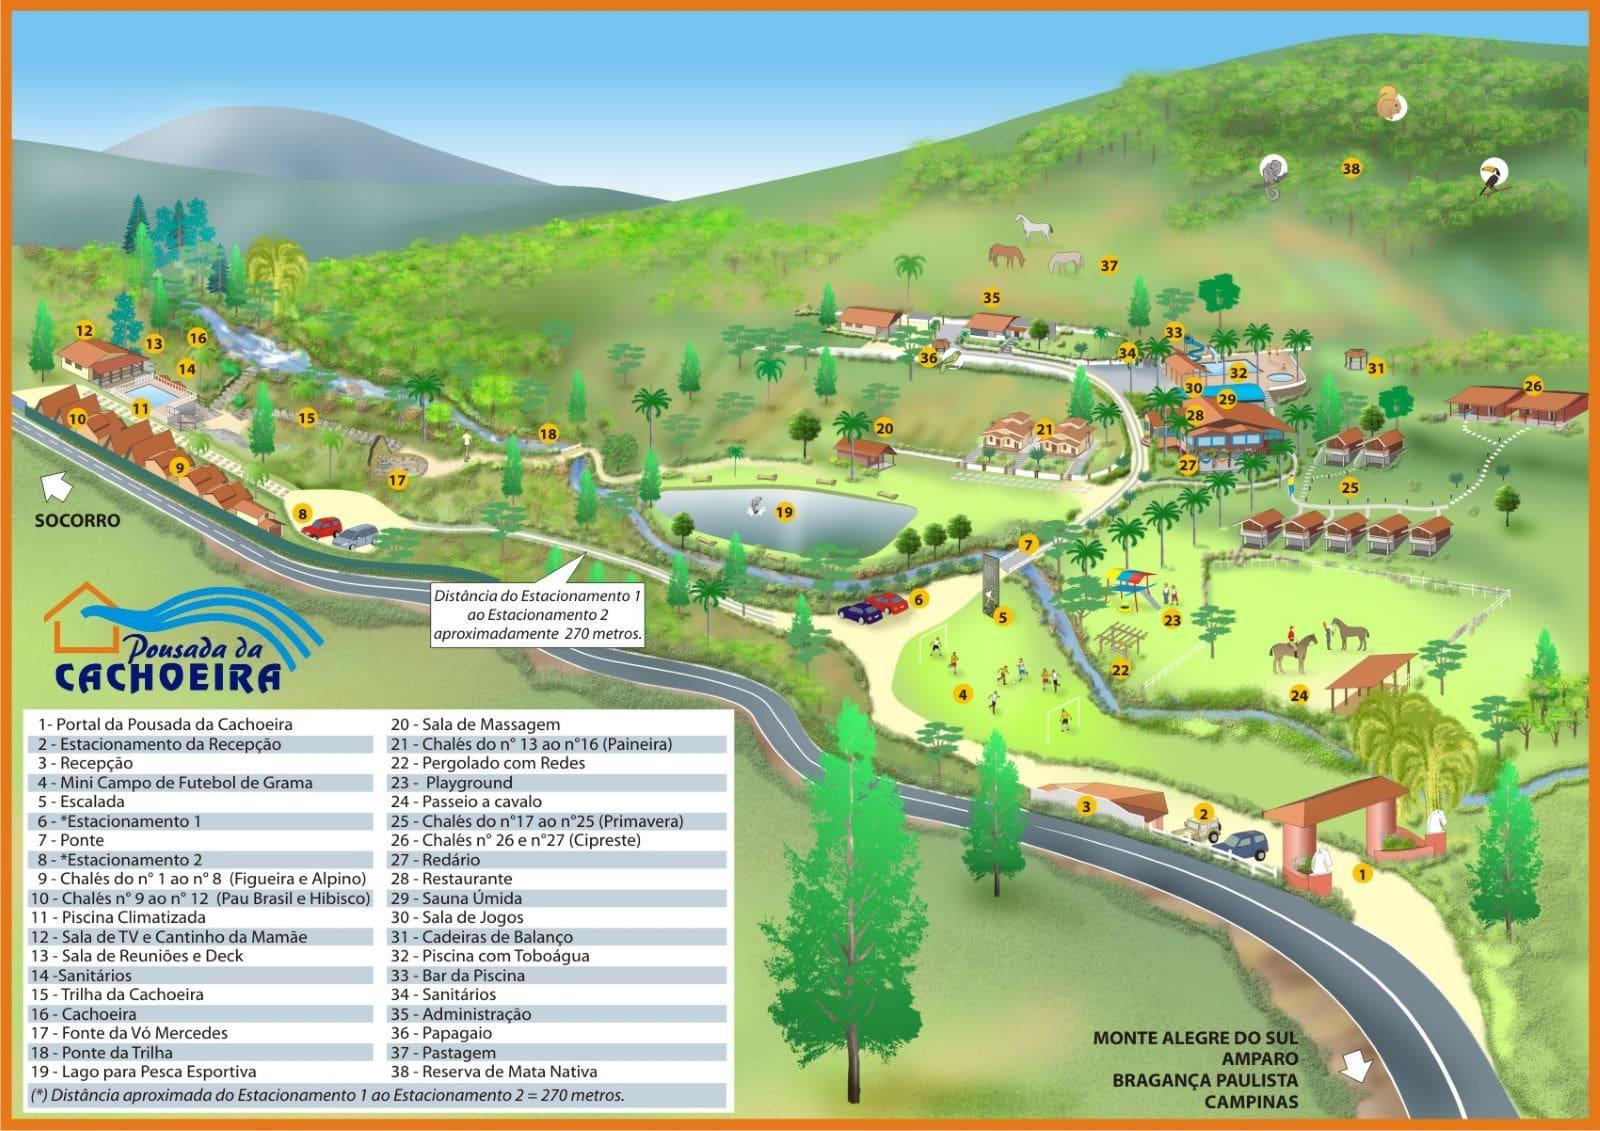 mapa da pousada da cachoeira